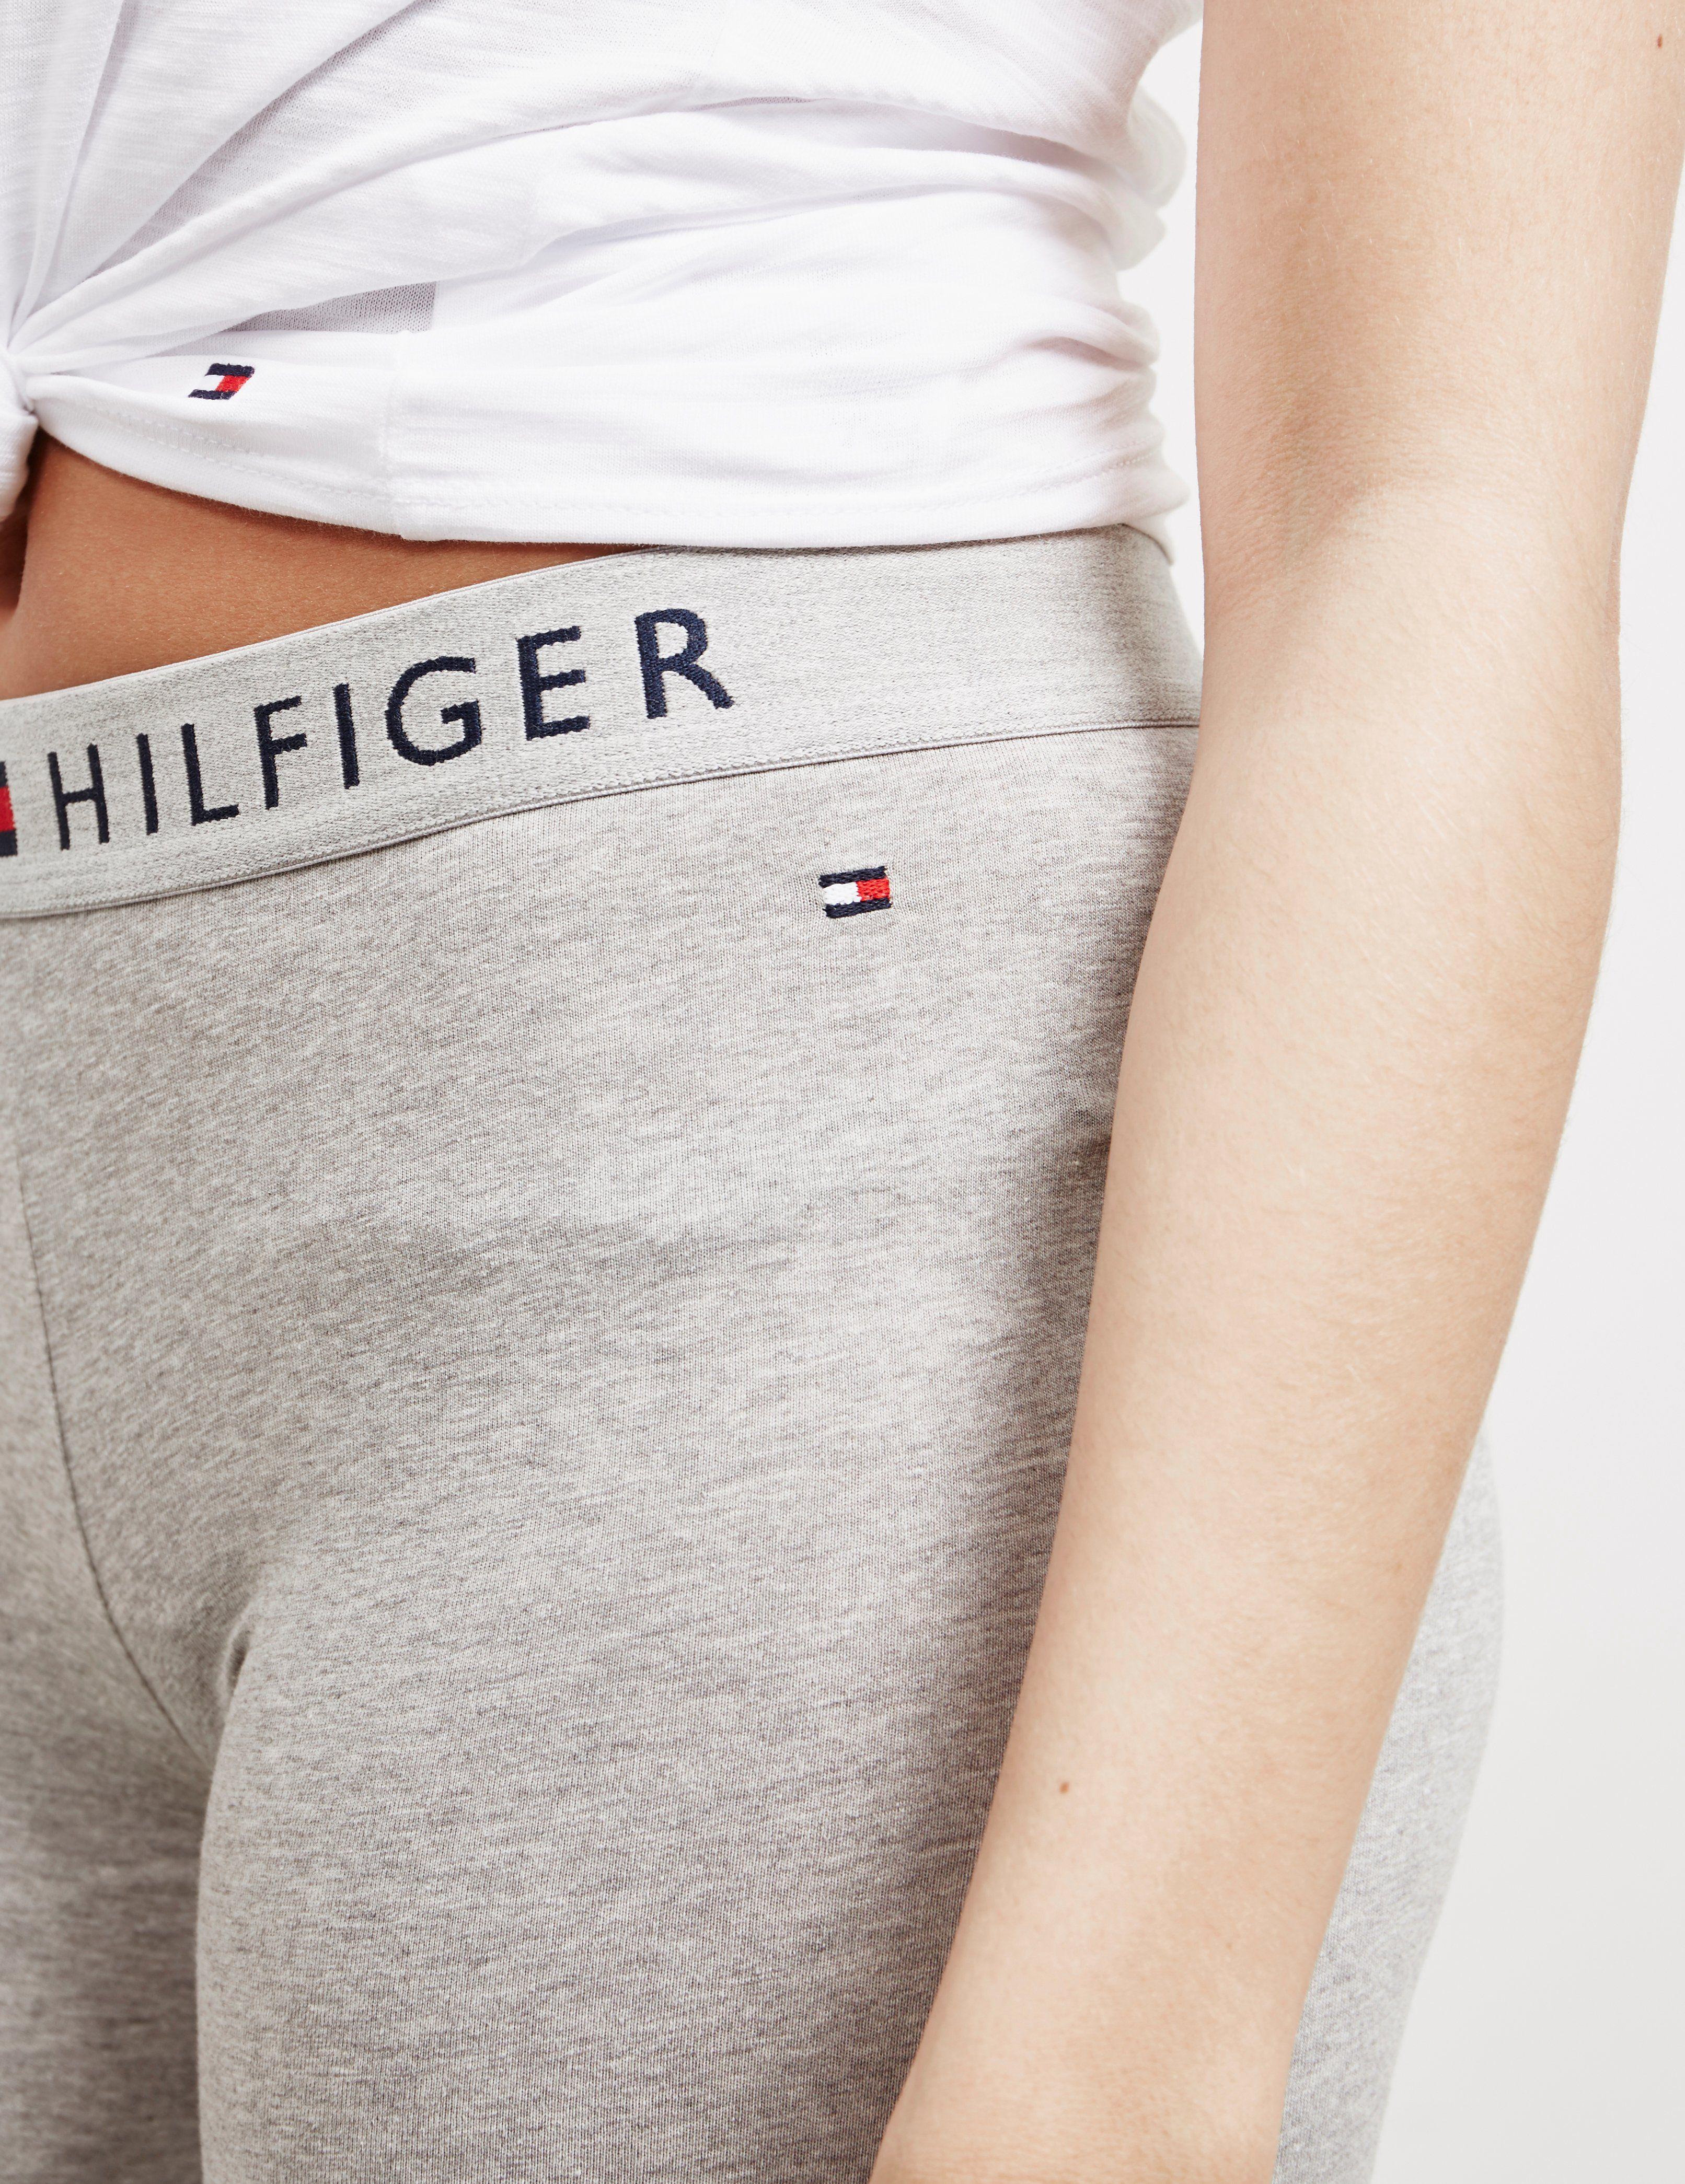 Tommy Hilfiger Origin Leggings